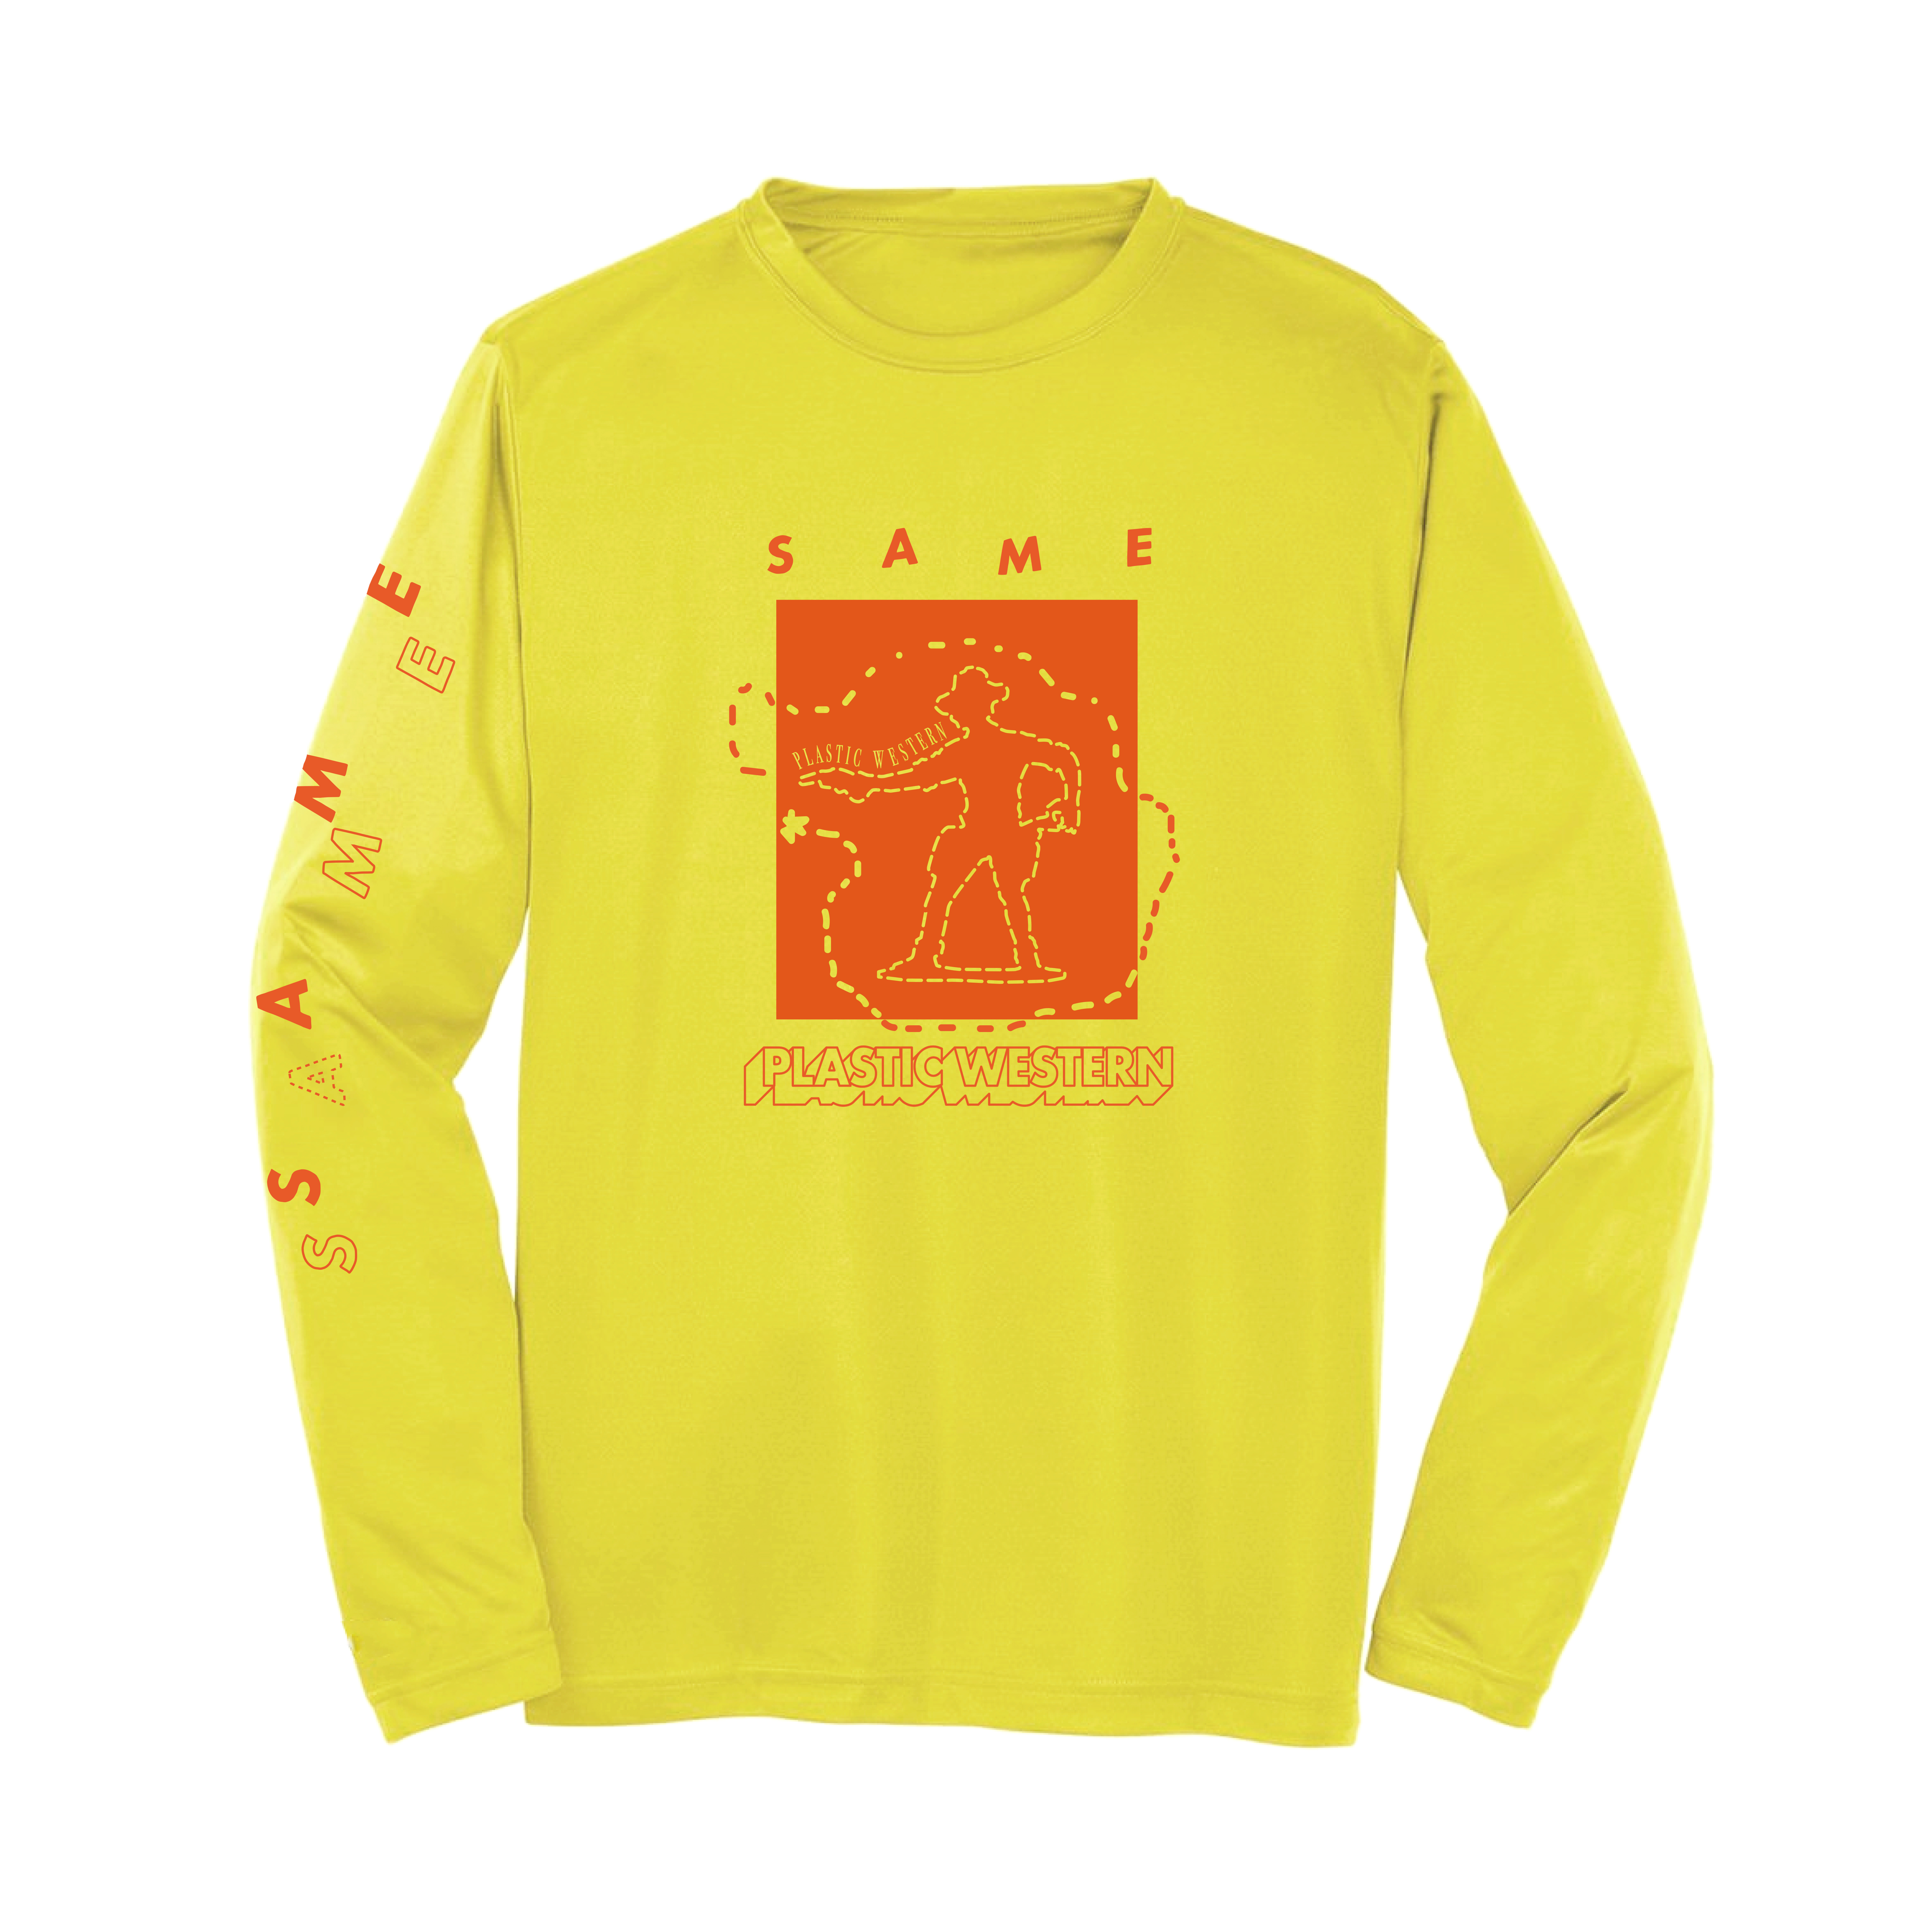 Same -  Abstract Yellow Longsleeve